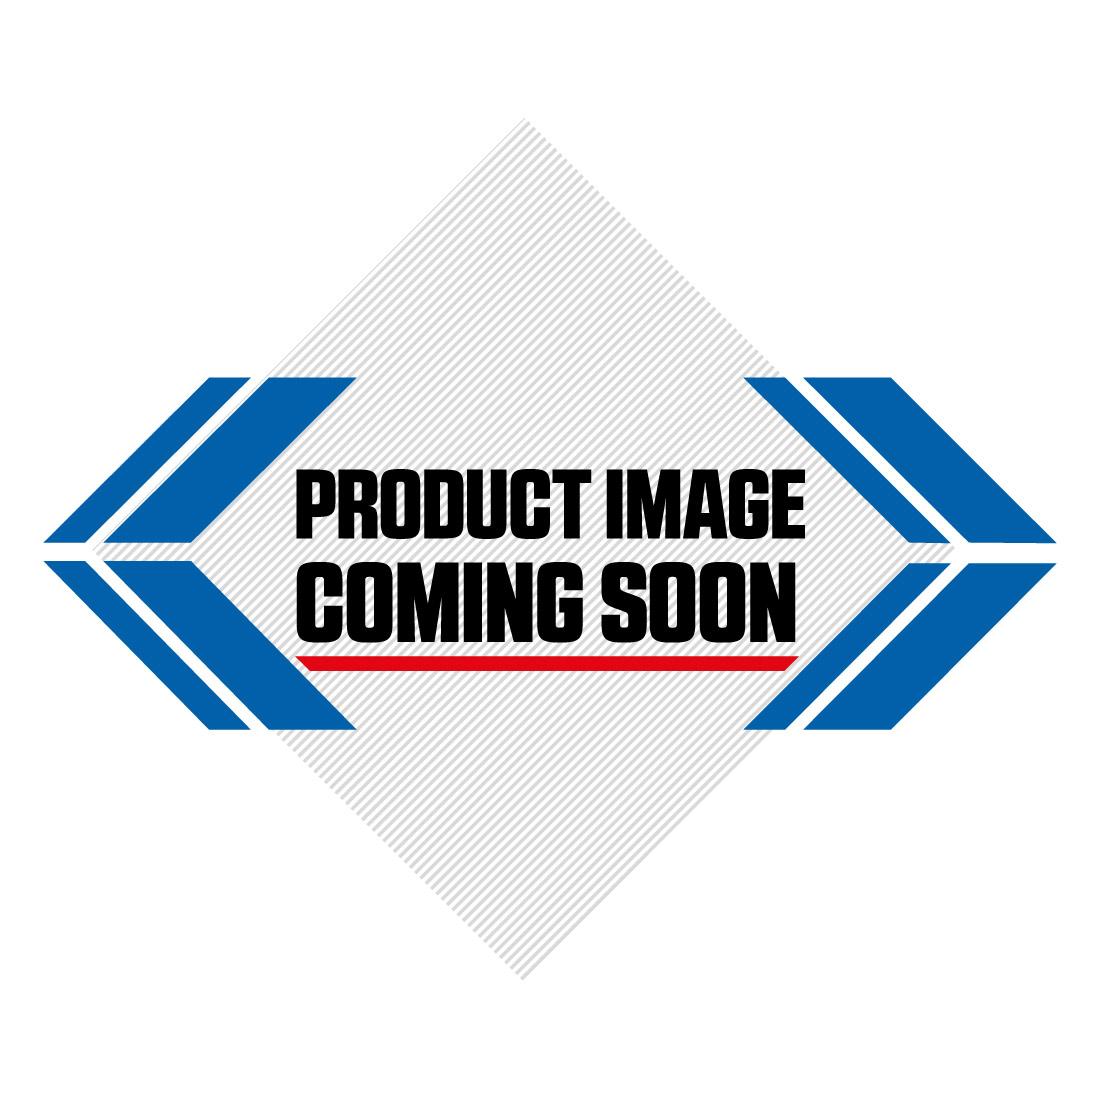 Honda Plastic Kit CRF 250 (18-20) 450 (17-20) OEM Factory Image-2>